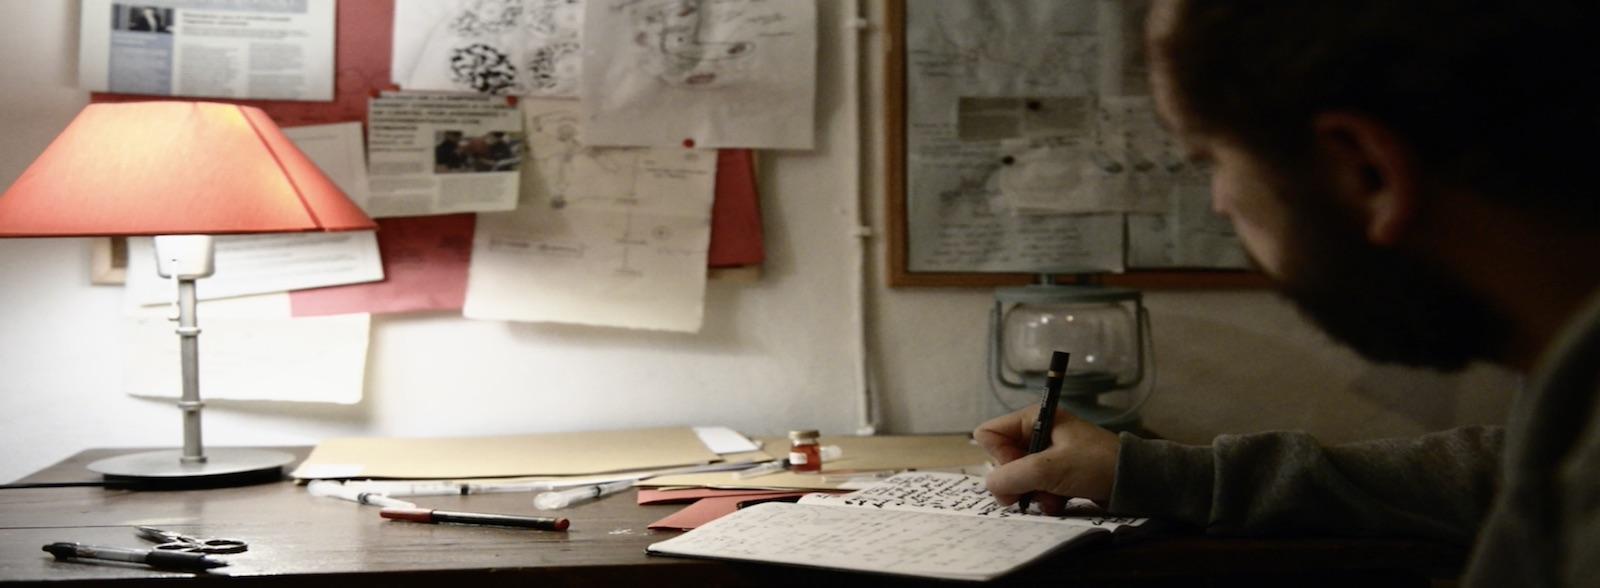 cortometraje-productora-audiovisual-barcelona-empresa